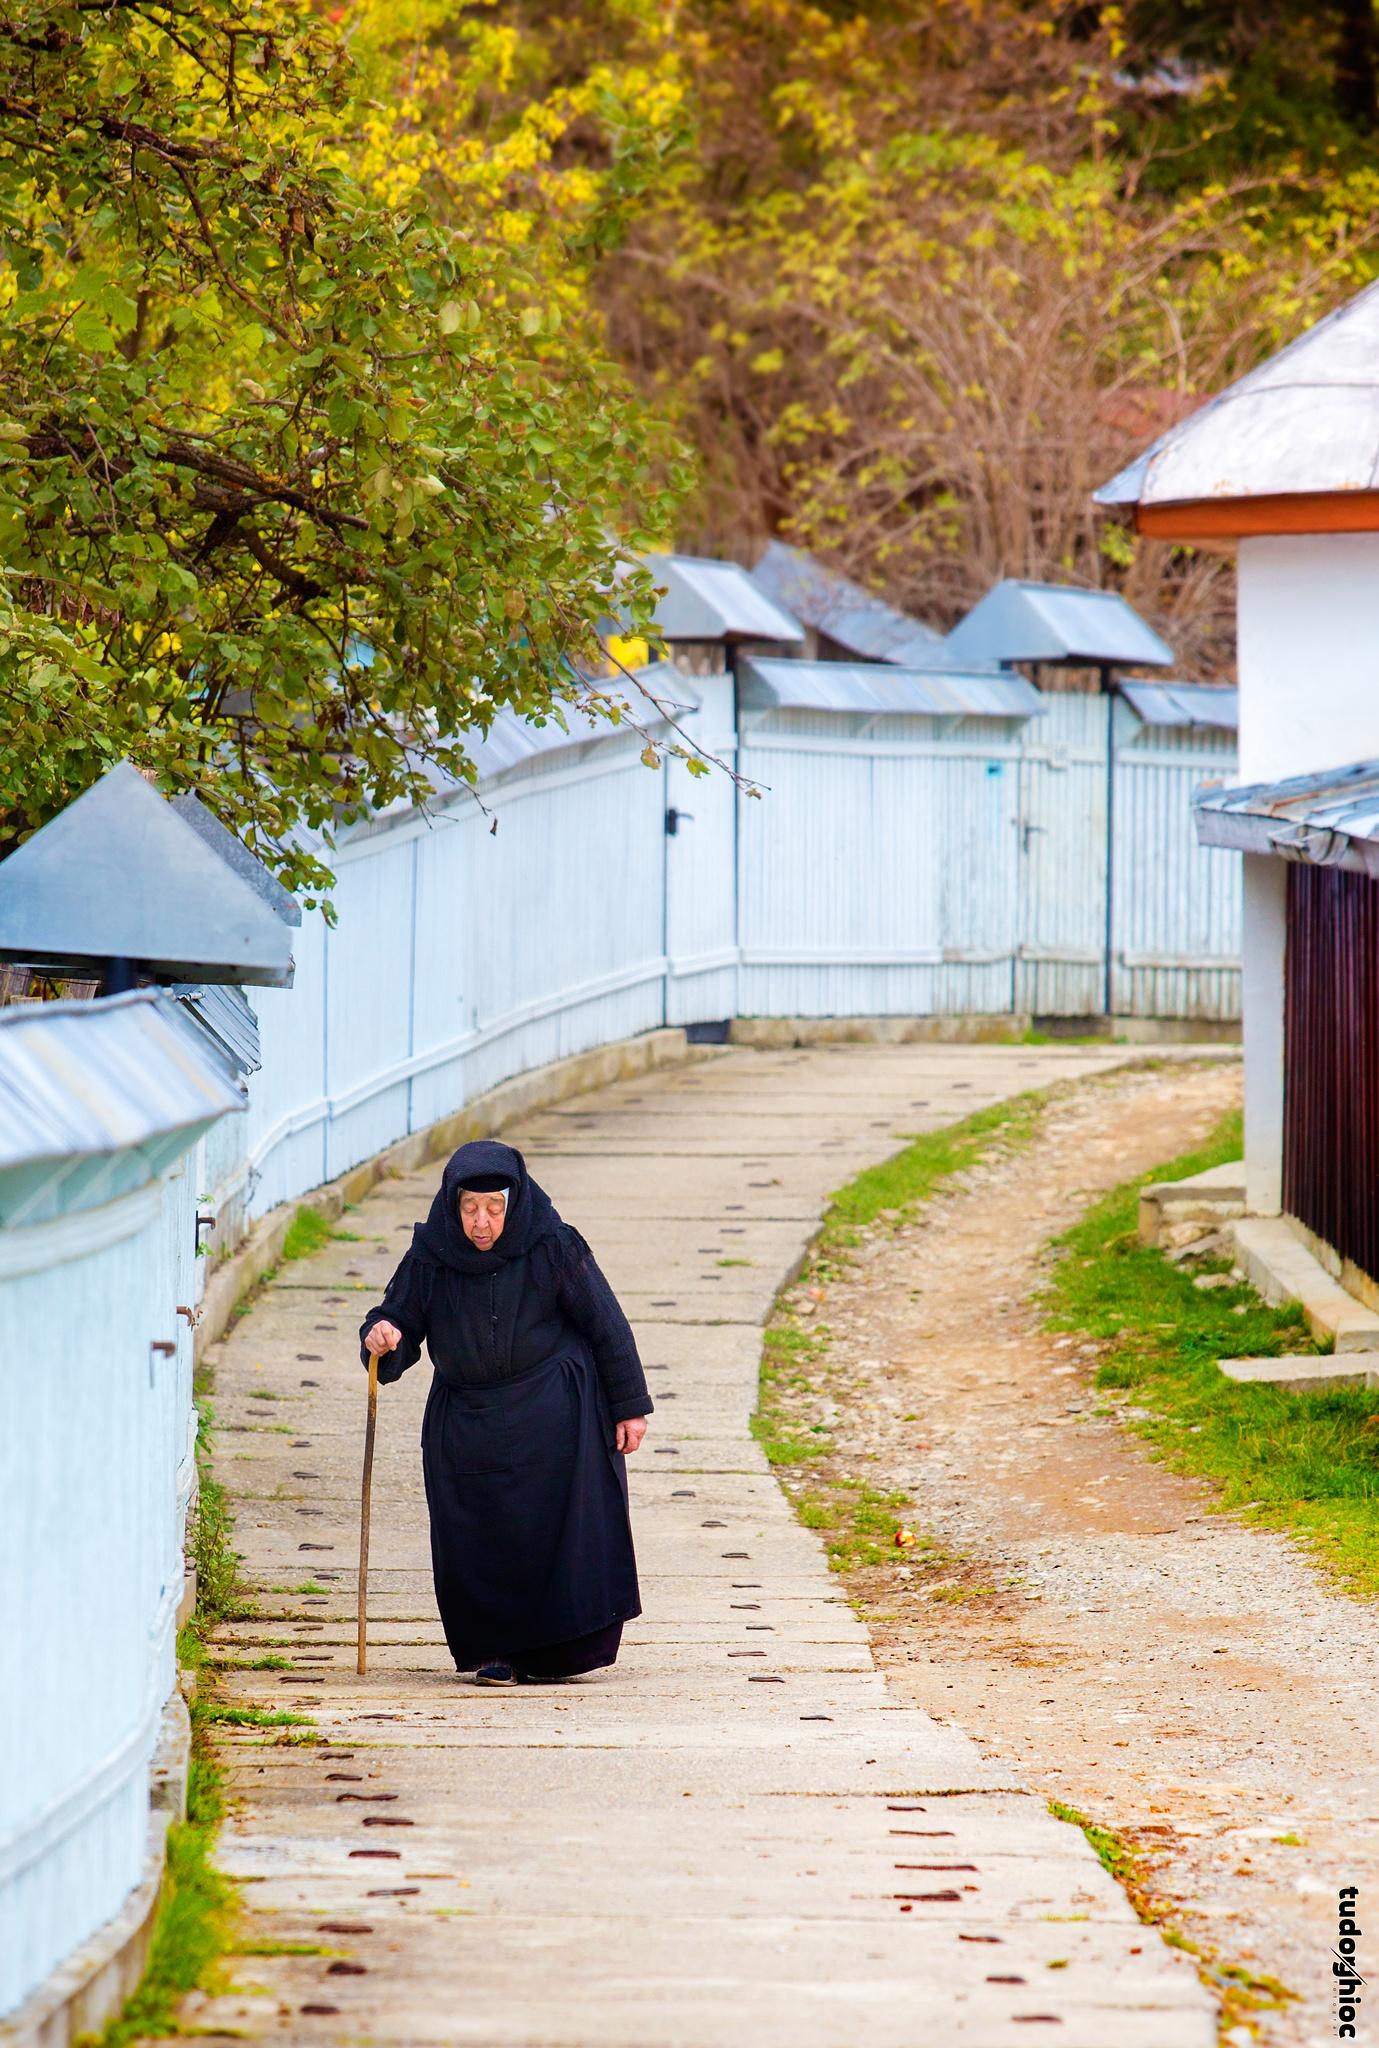 People of monastery  by tudorghioc